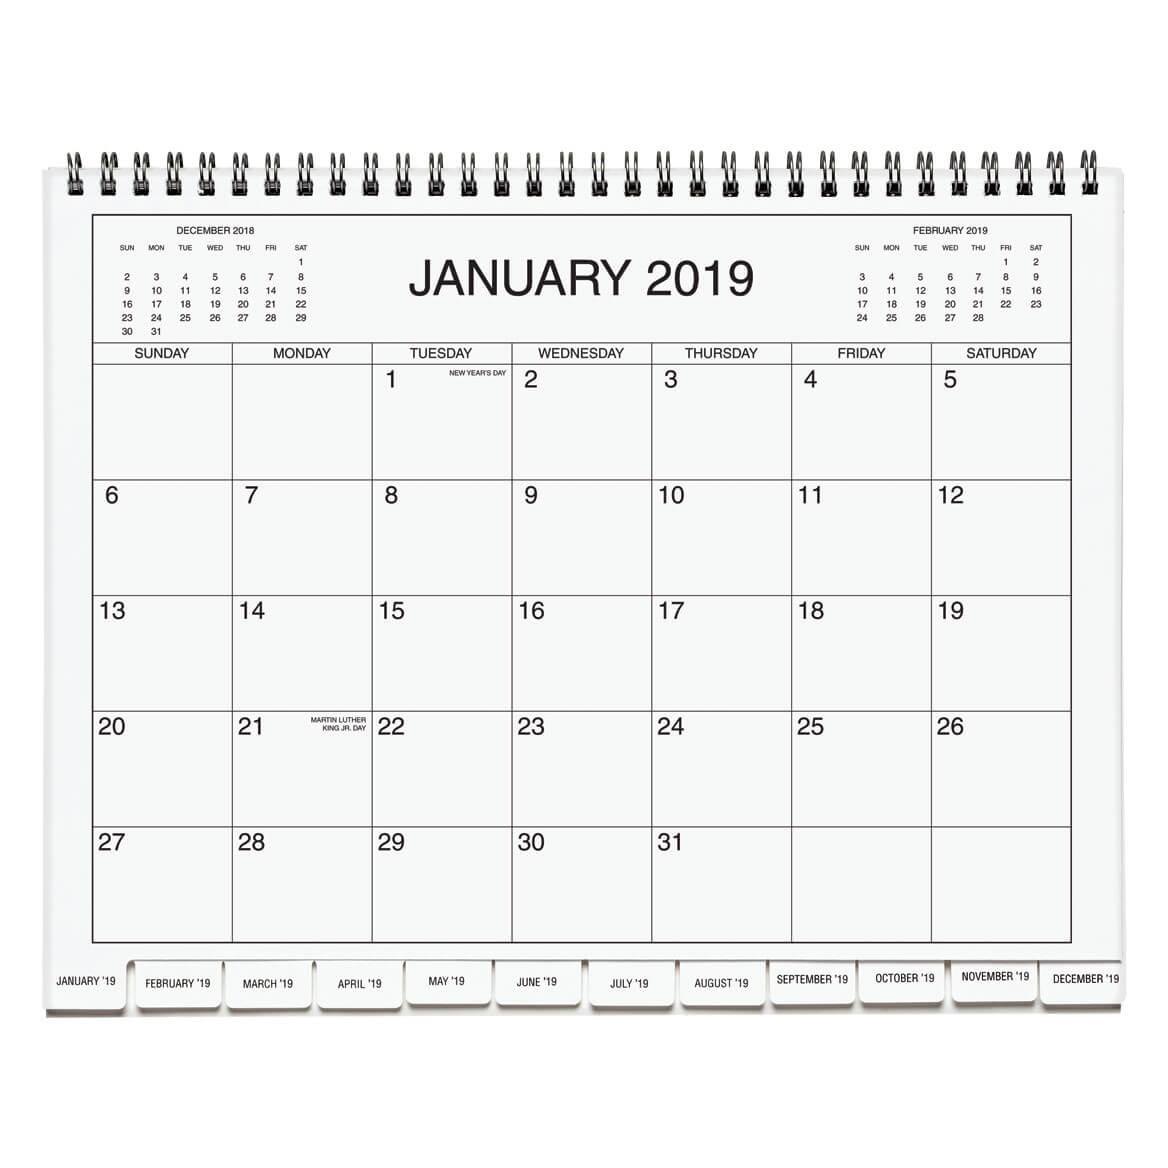 3 year calendar 2019 2021 view 2